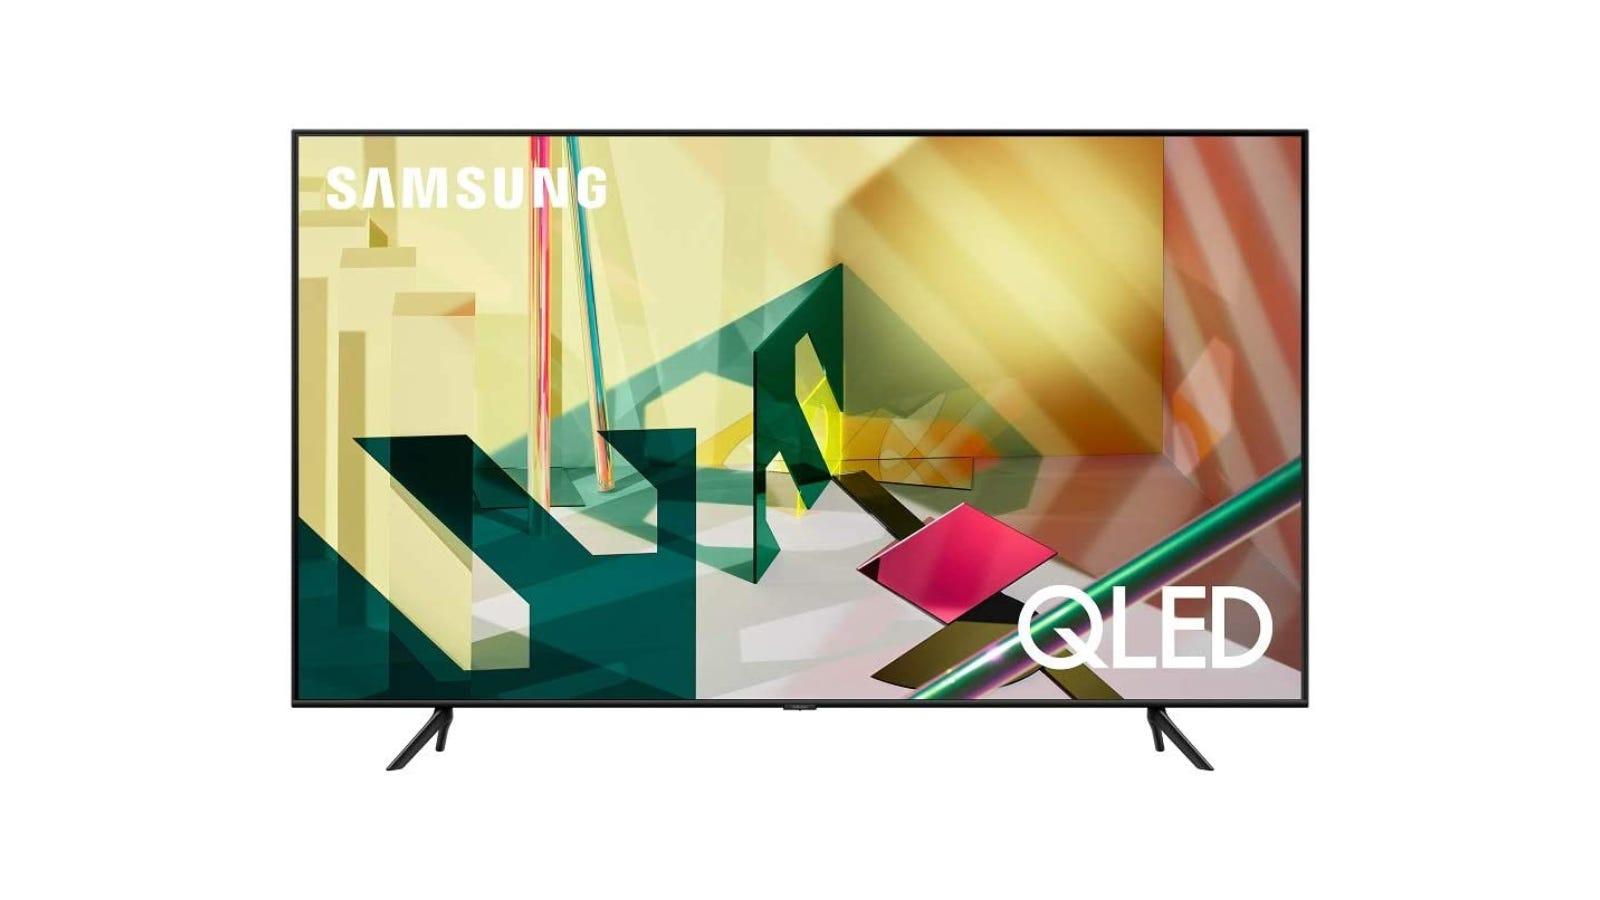 SAMSUNG Q70T Series TV